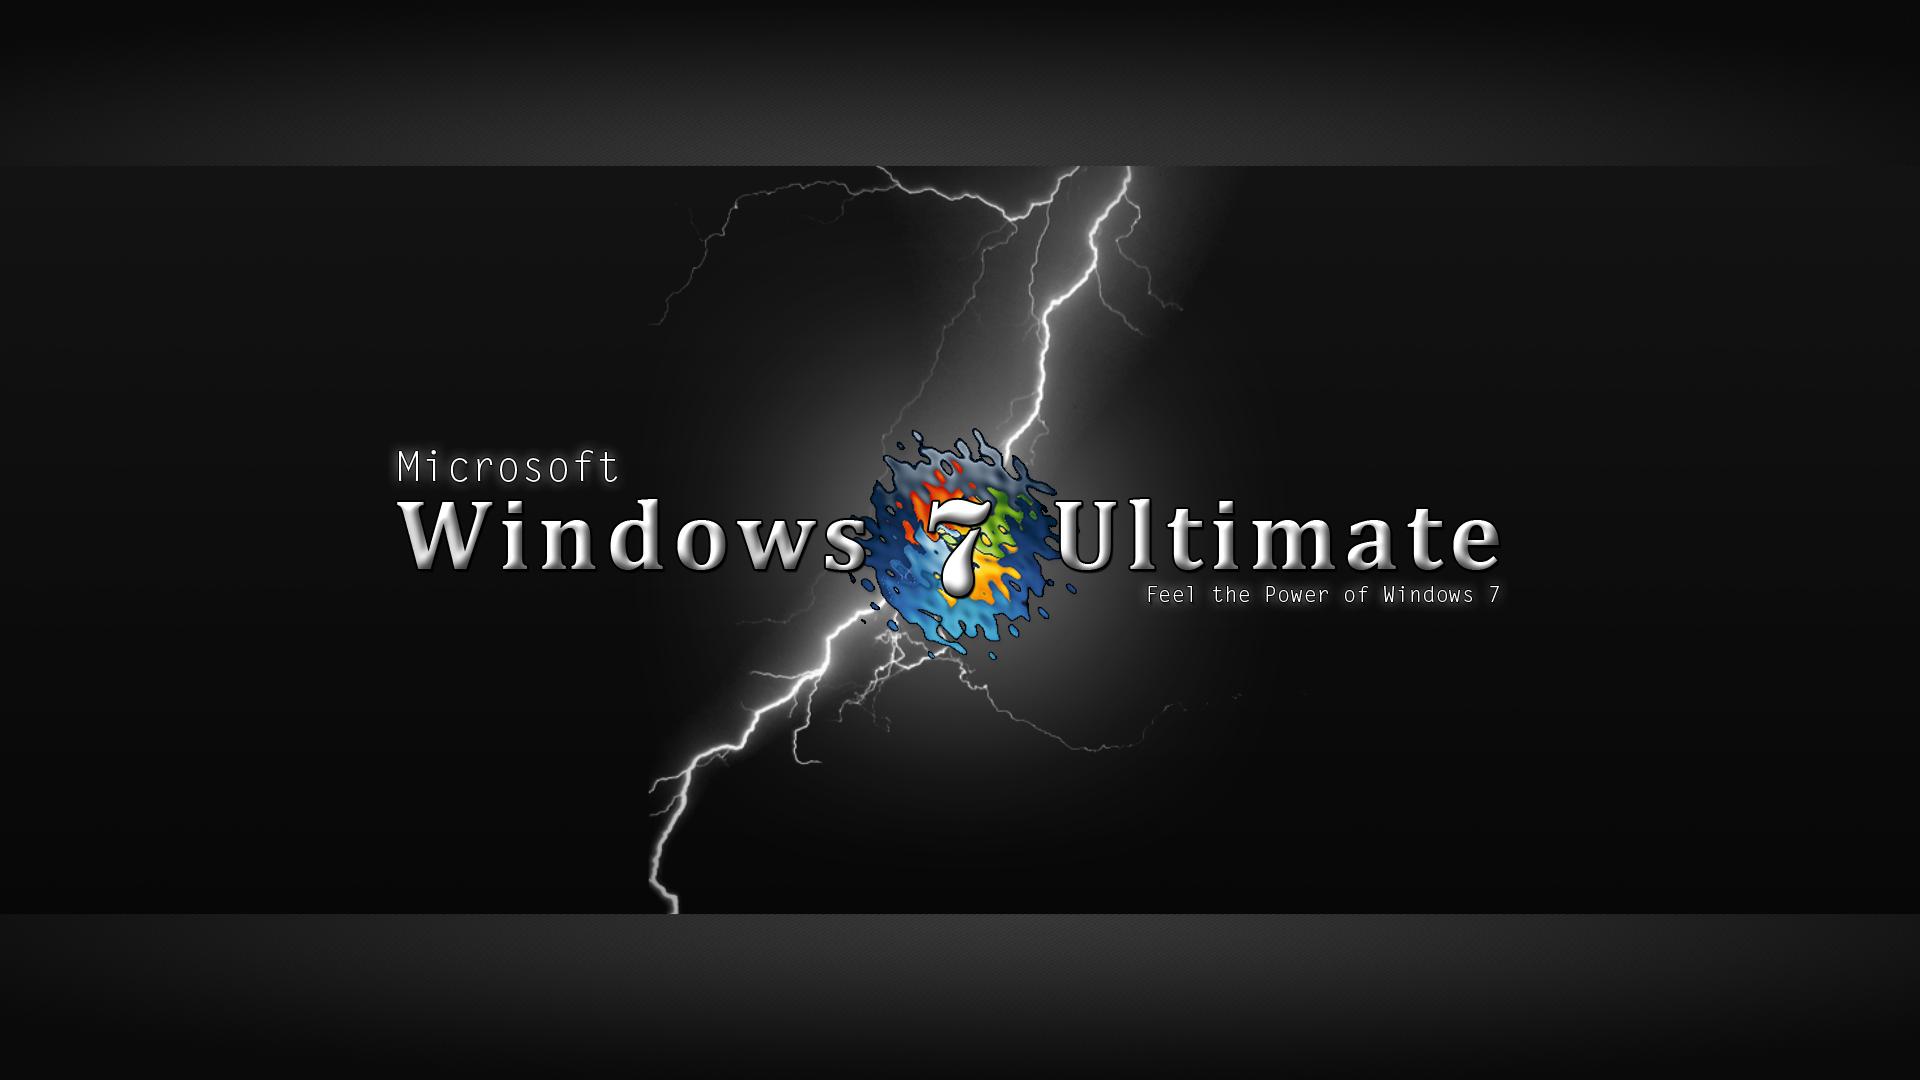 Windows 7 Ultimate Black Wallpaper Brands Wallpaper Background 1920x1080